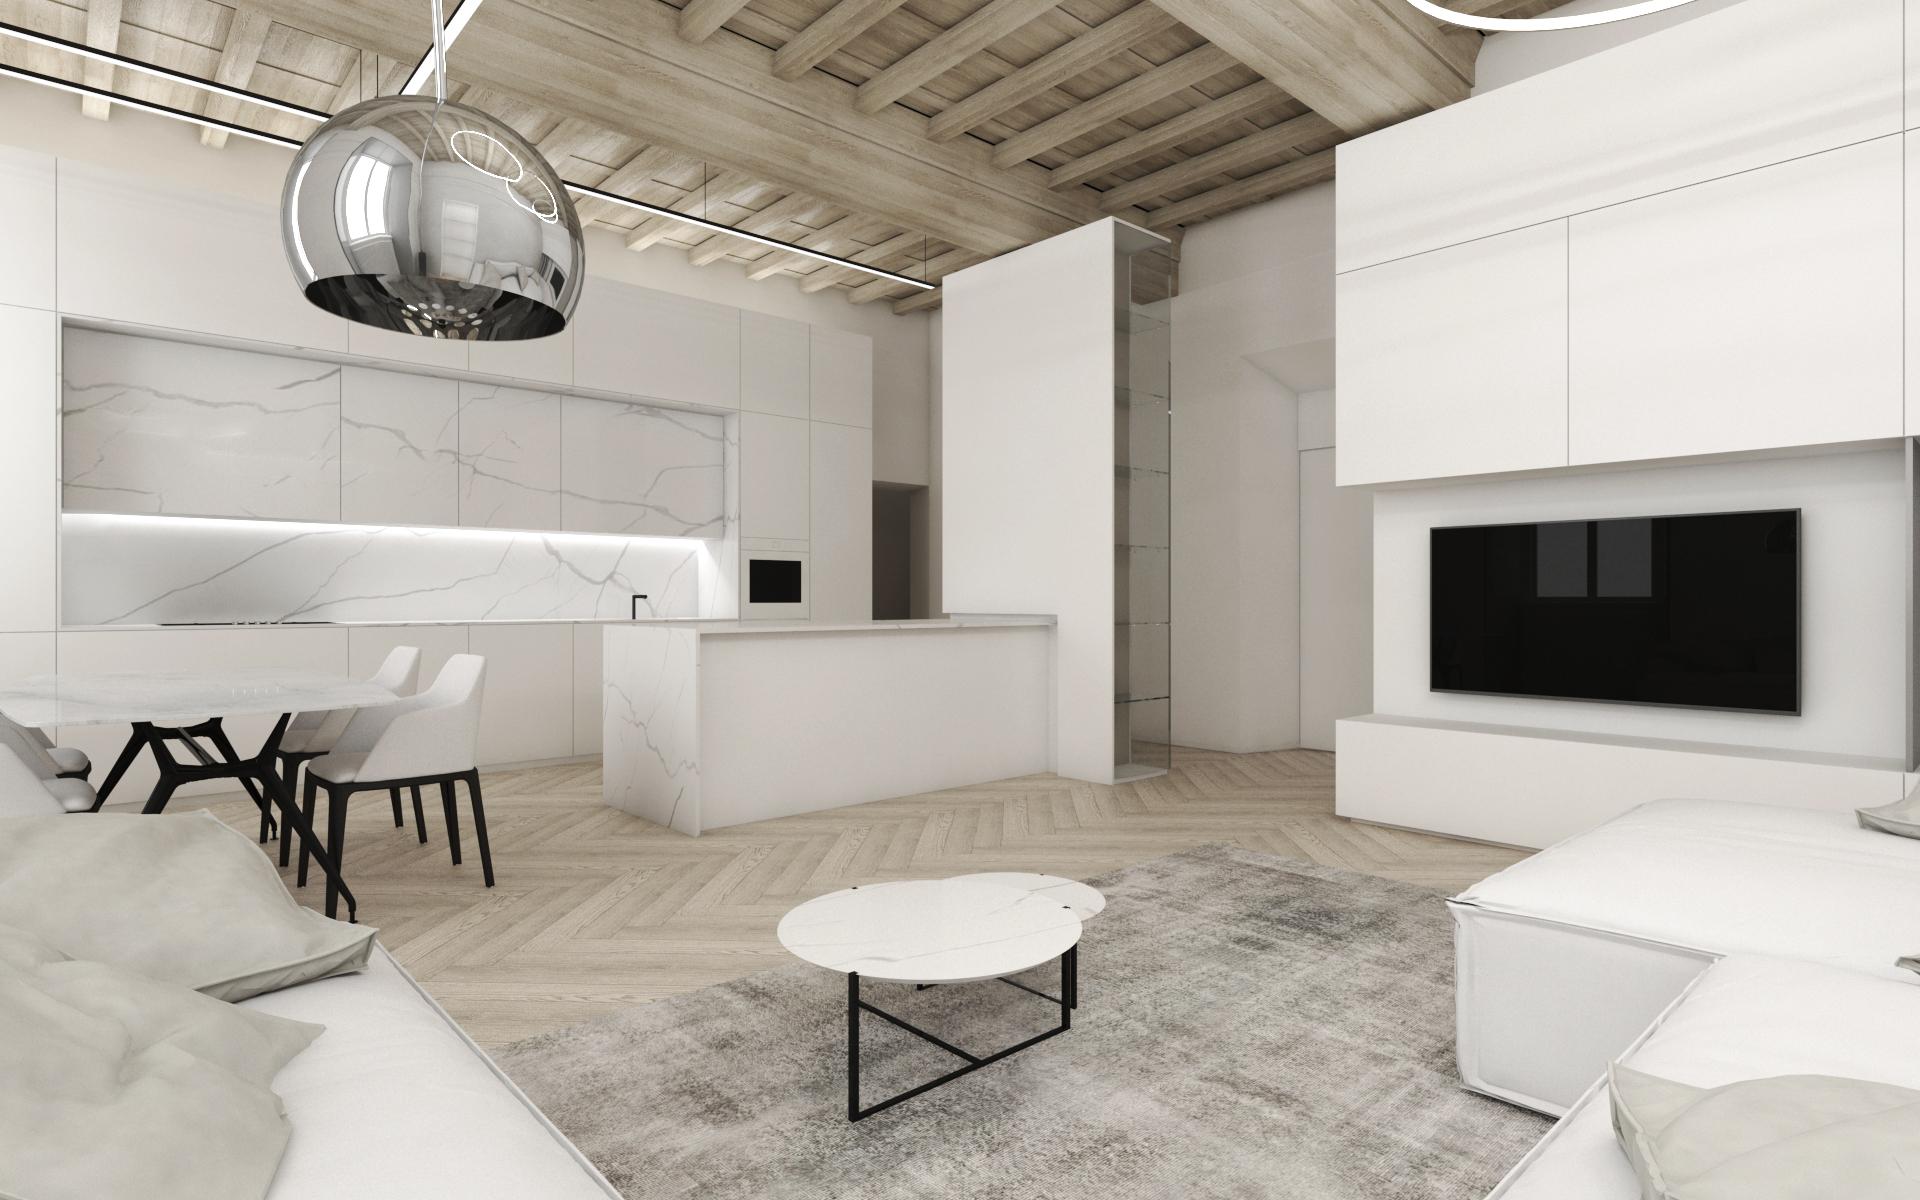 1803_DFG-Architetti-Associati_CASA-GIANNINI_-4